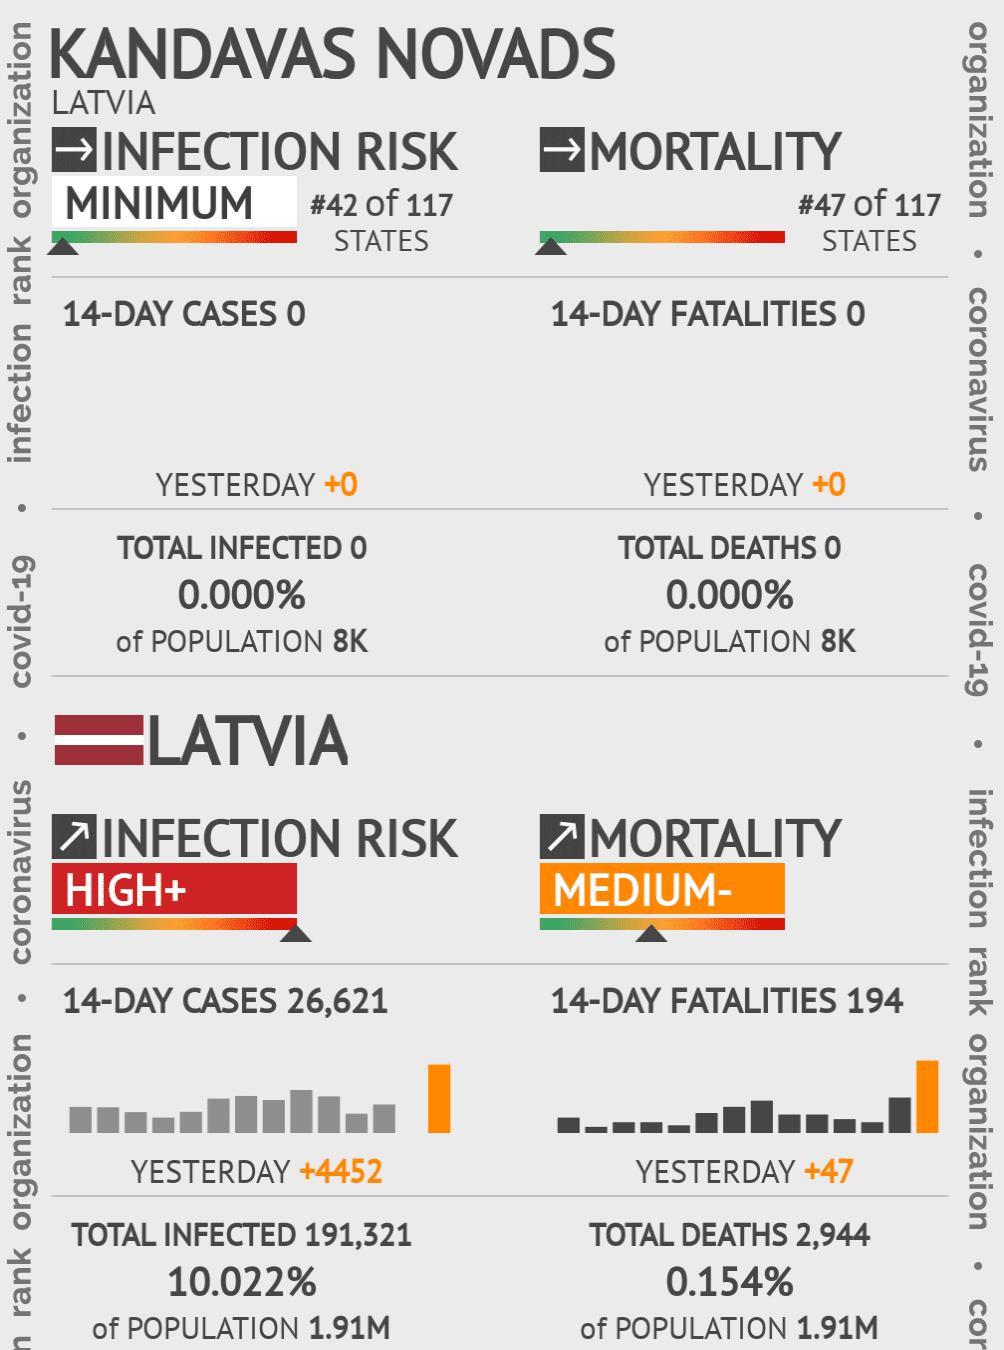 Kandavas novads Coronavirus Covid-19 Risk of Infection on May 06, 2020